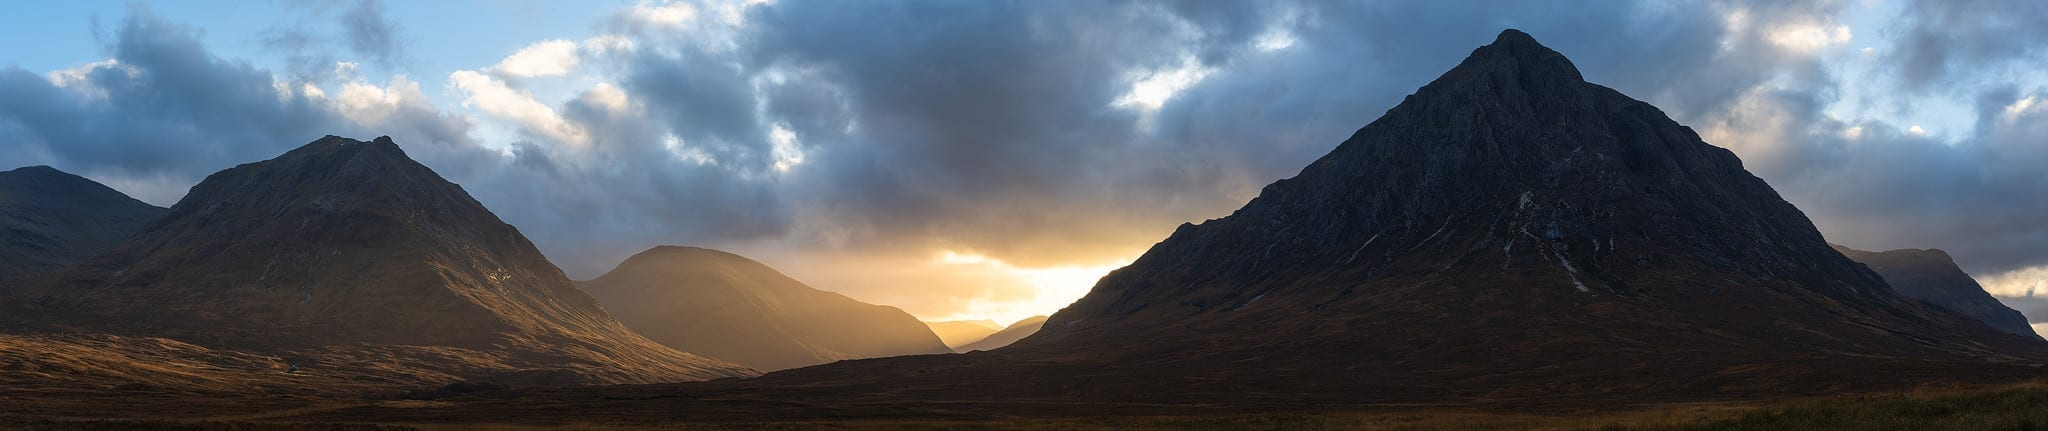 Glencoe Sunset - Scotland Landscape Photography